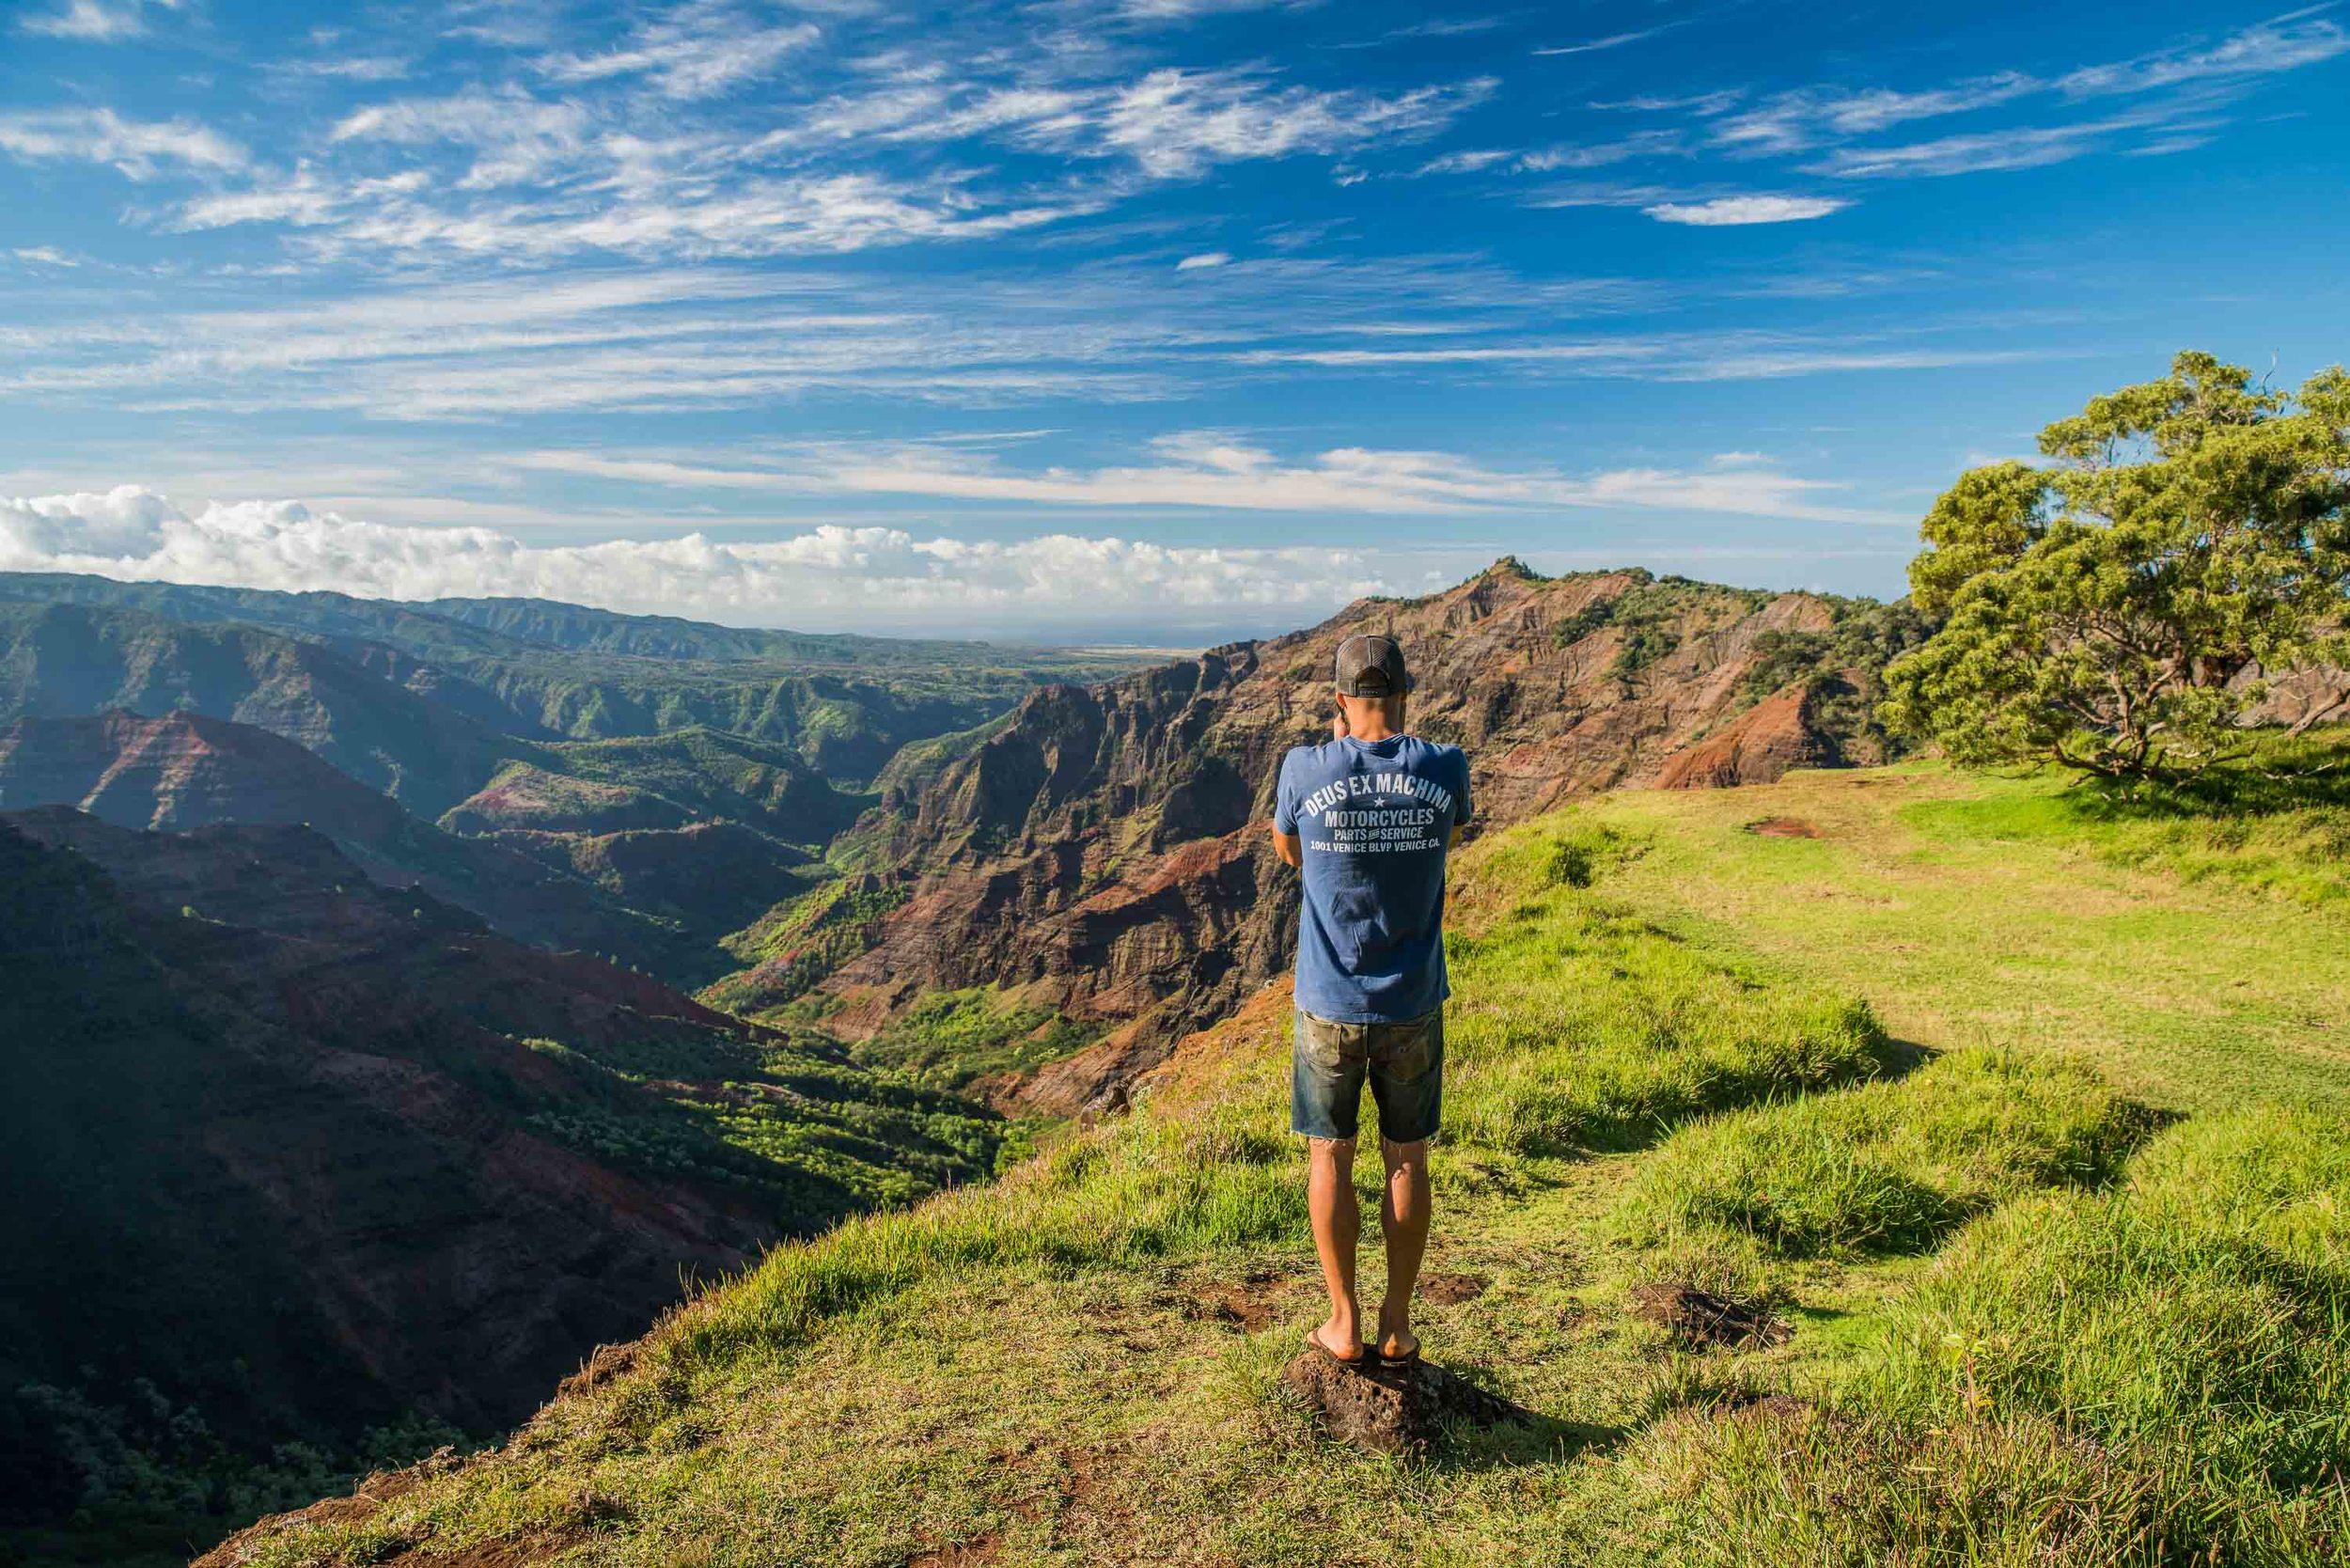 bryce-johnson-kalalau-ridge-kauai-hiking-hammock-palmwood-aloha-exchange-2.jpg